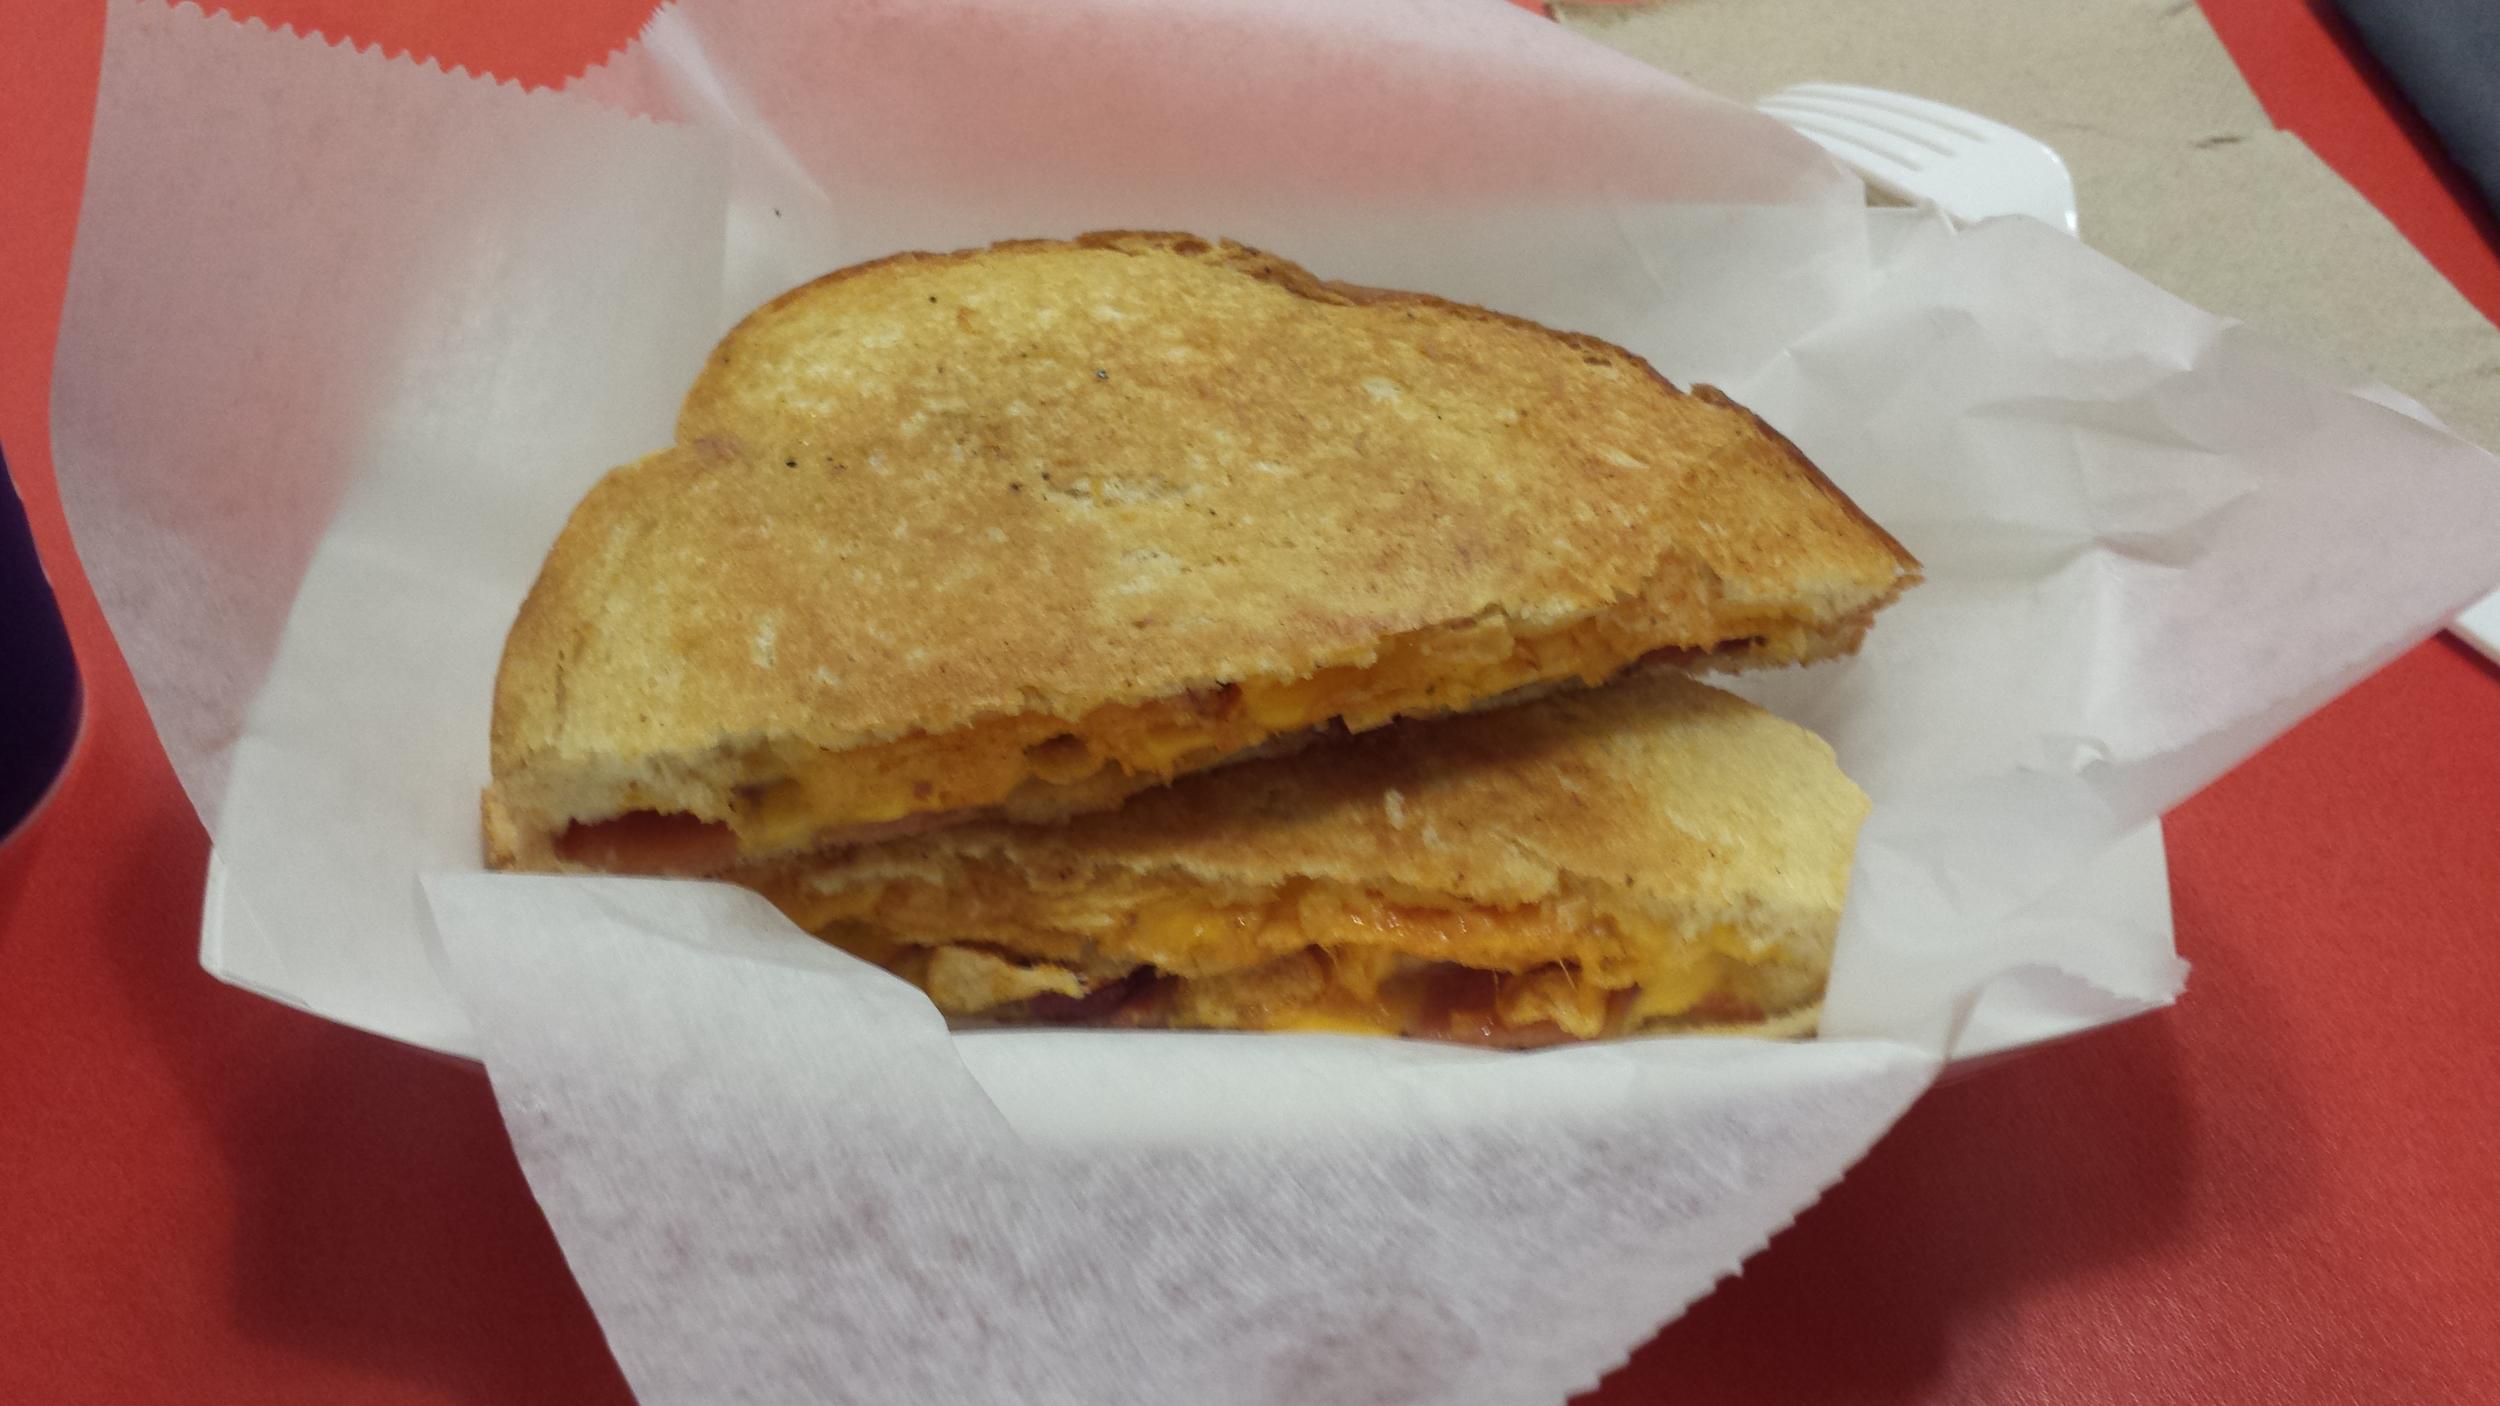 Cheddar Cheese, Bacon, BBQ Cape Cod Potato Chips, Thick Cut Sourdough